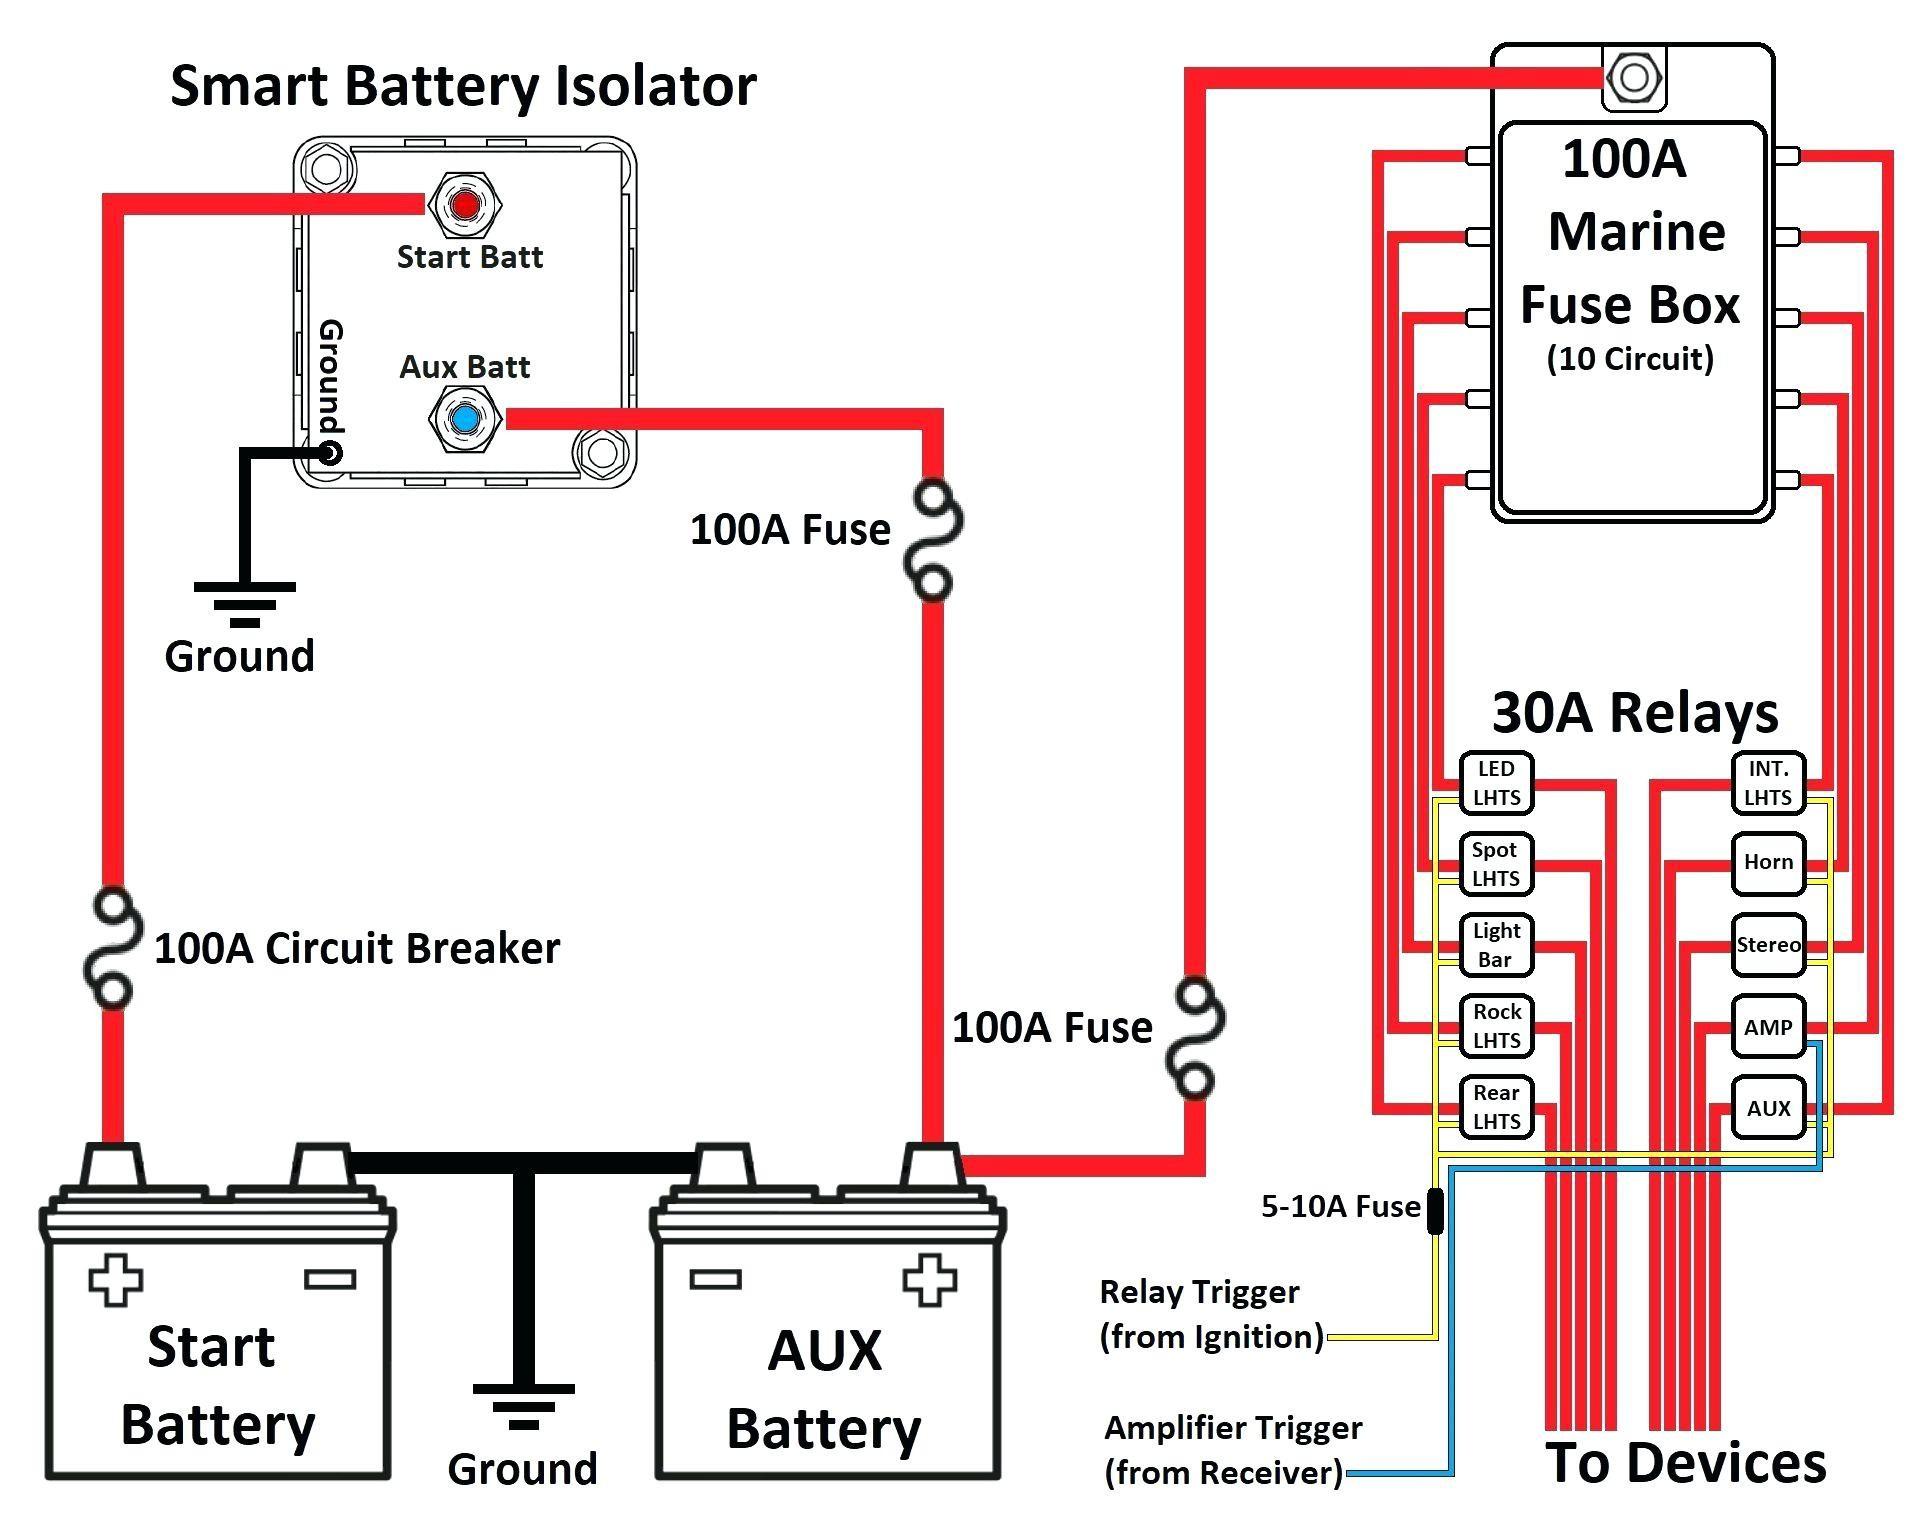 Boat Battery Wiring Diagram Boat Dual Battery Switch Wiring Diagram Webtor Best Ideas Of Boat Battery Wiring Diagram